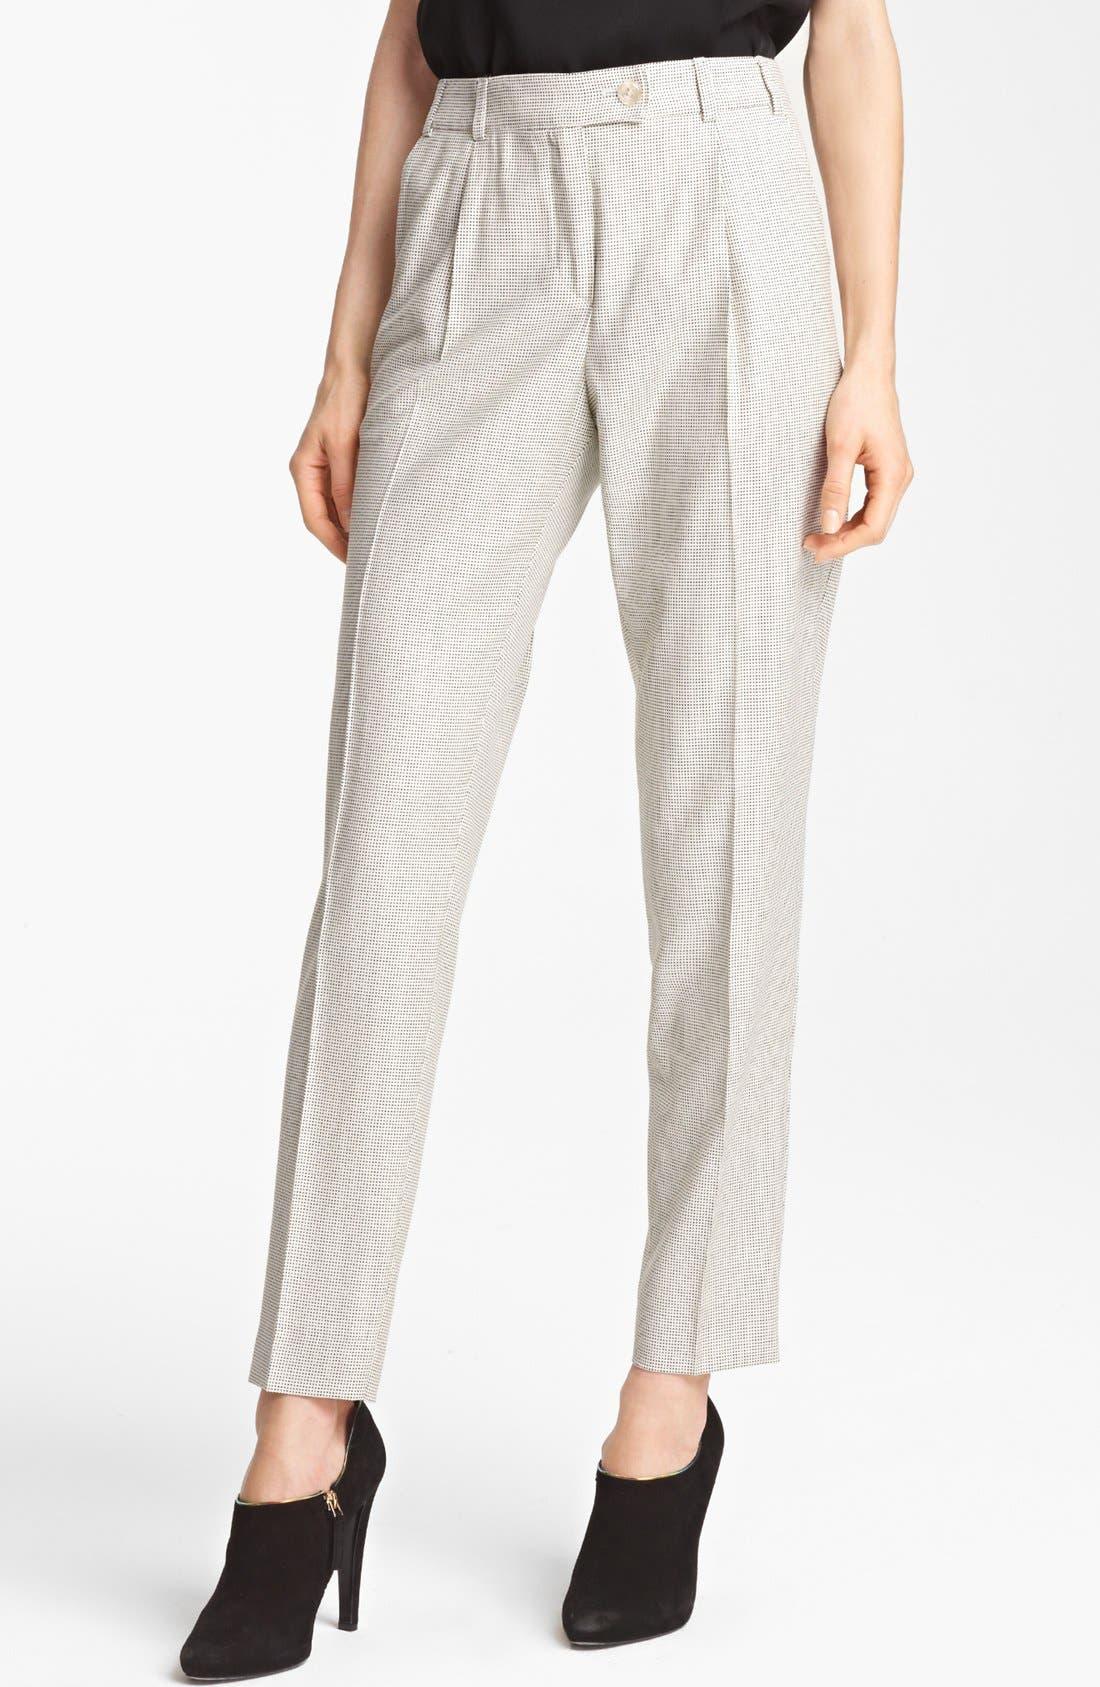 Alternate Image 1 Selected - Armani Collezioni Narrow Leg Pants